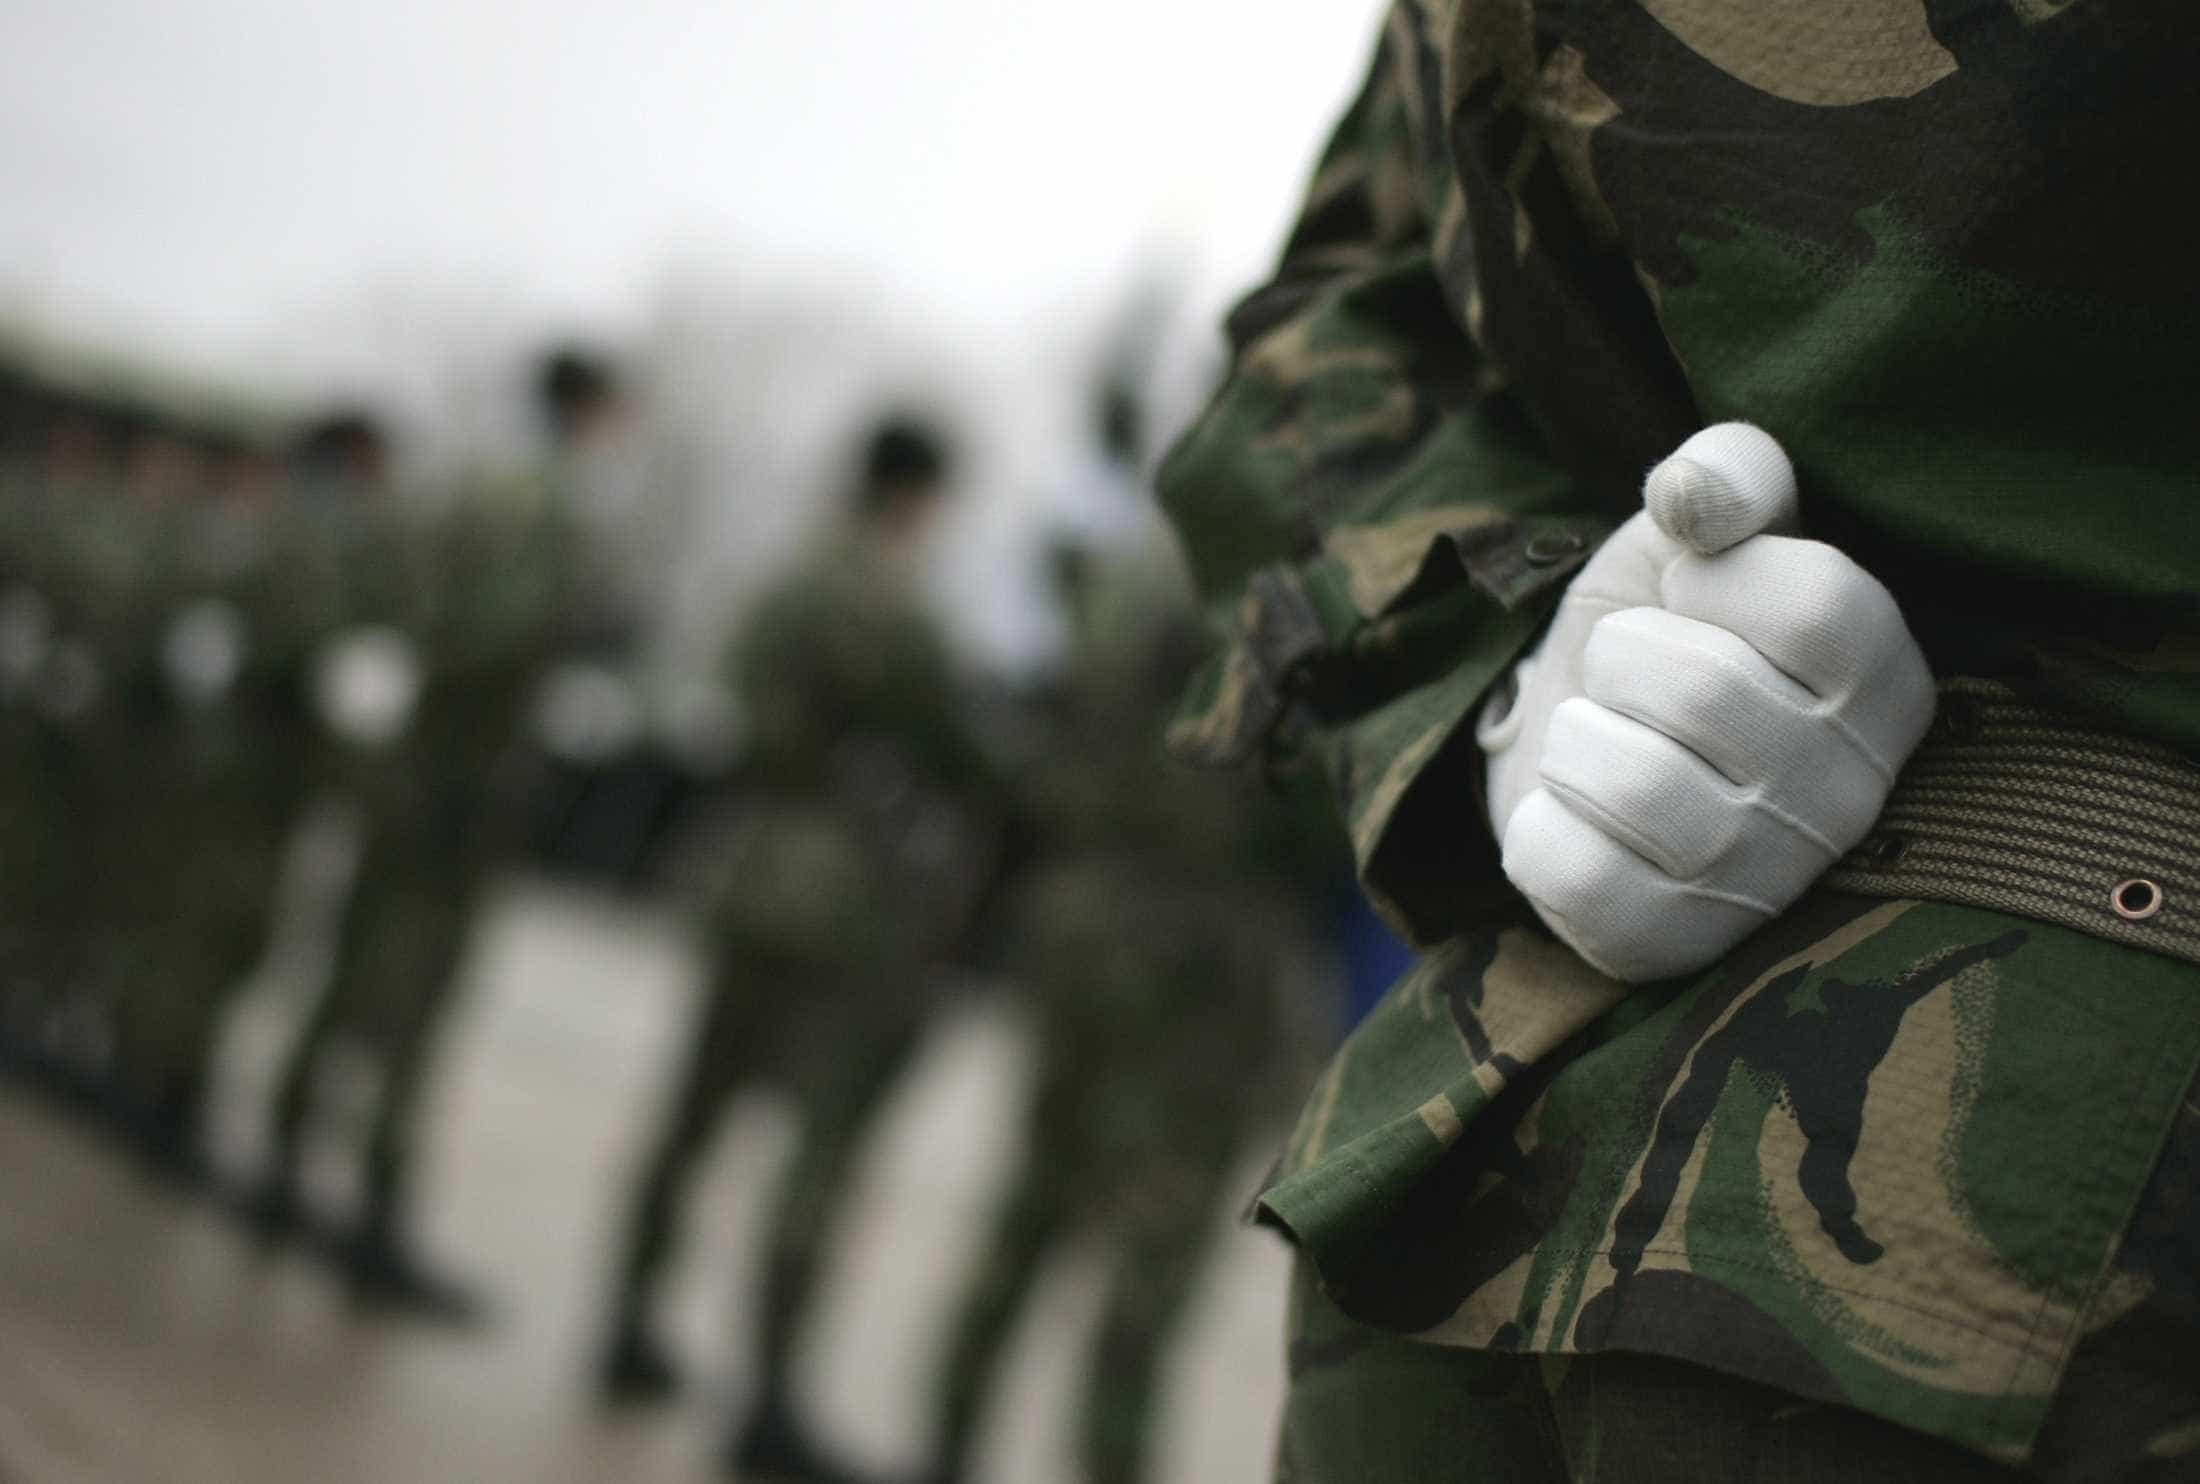 Ministério confirma que major era fiador de casa subalugada ilegalmente